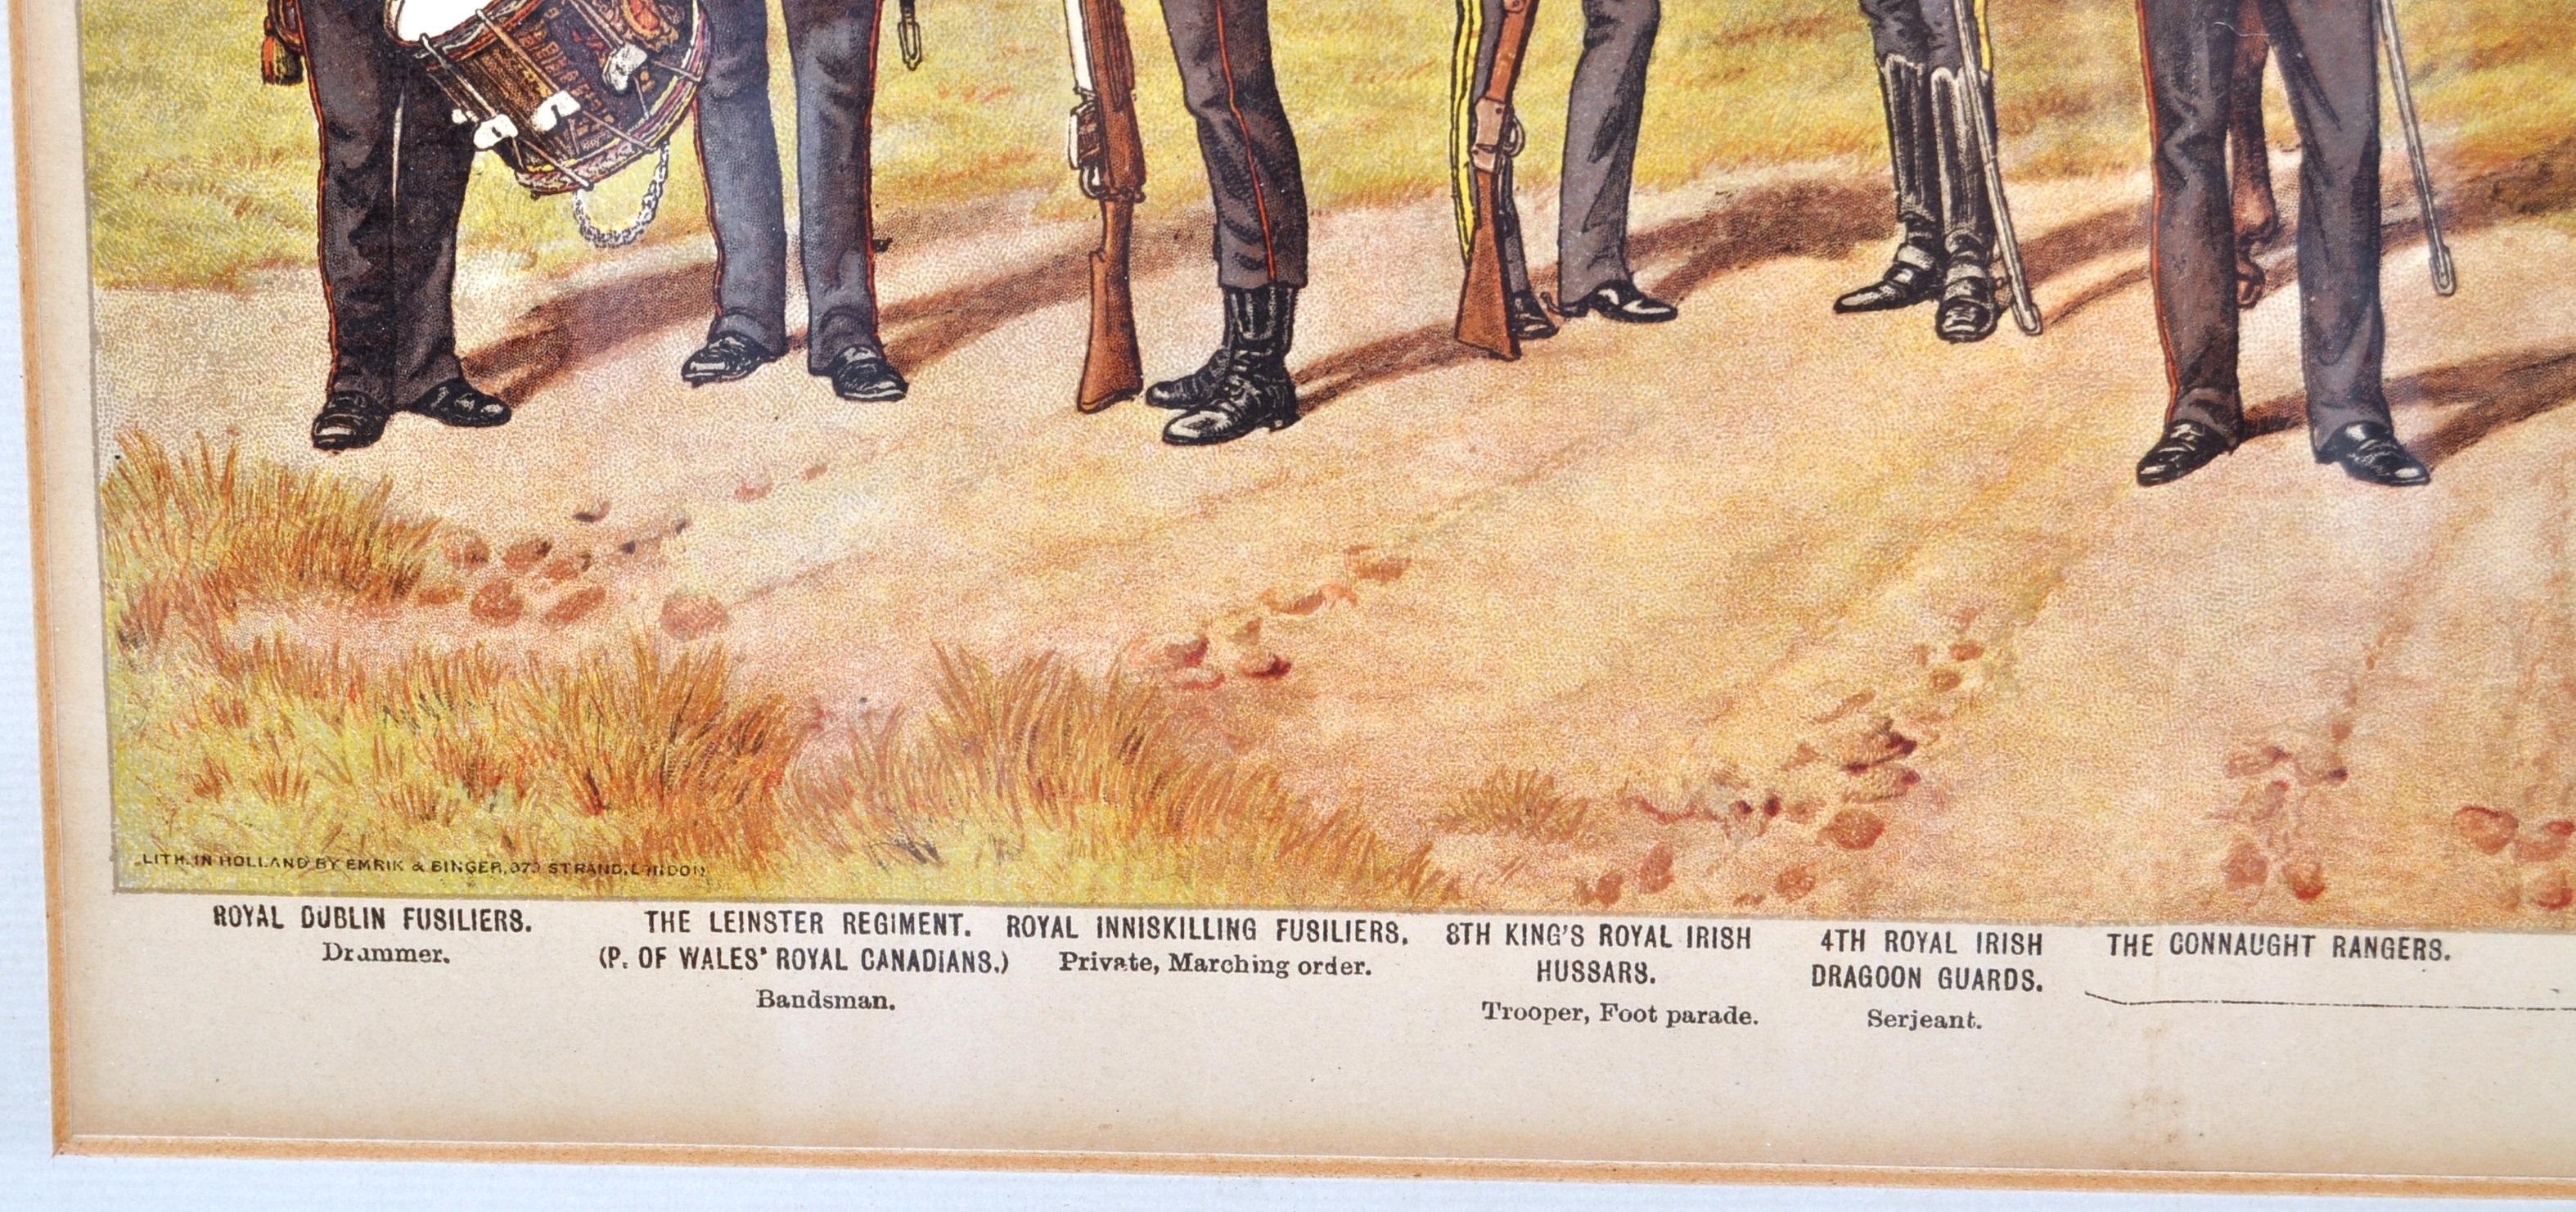 RICHARD SIMKIN - THE IRISH REGIMENTS OF THE BRITISH ARMY - Image 4 of 7